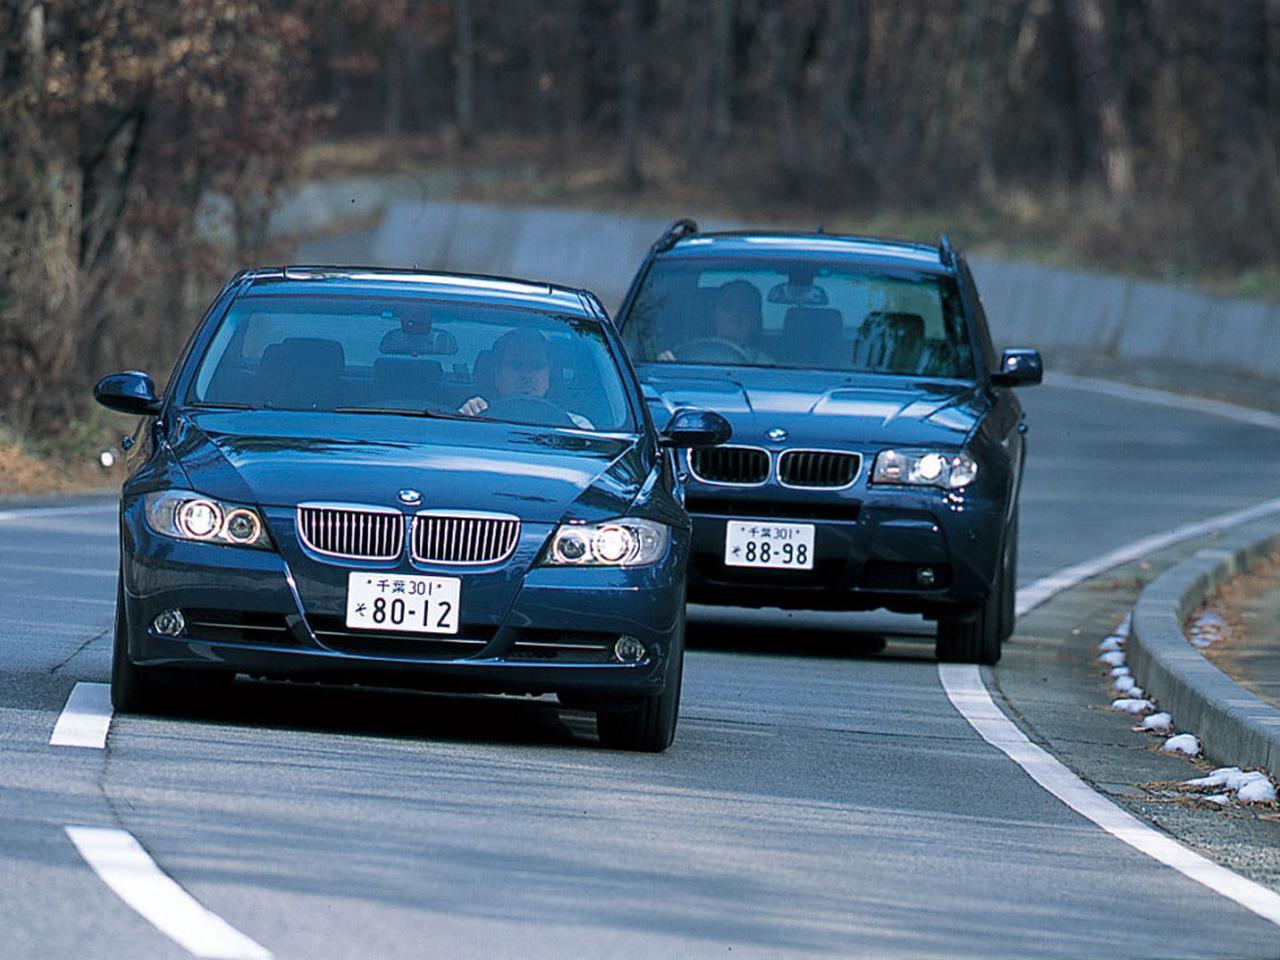 Images : 1番目の画像 - BMW X3 2.5iと330xi - Webモーターマガジン